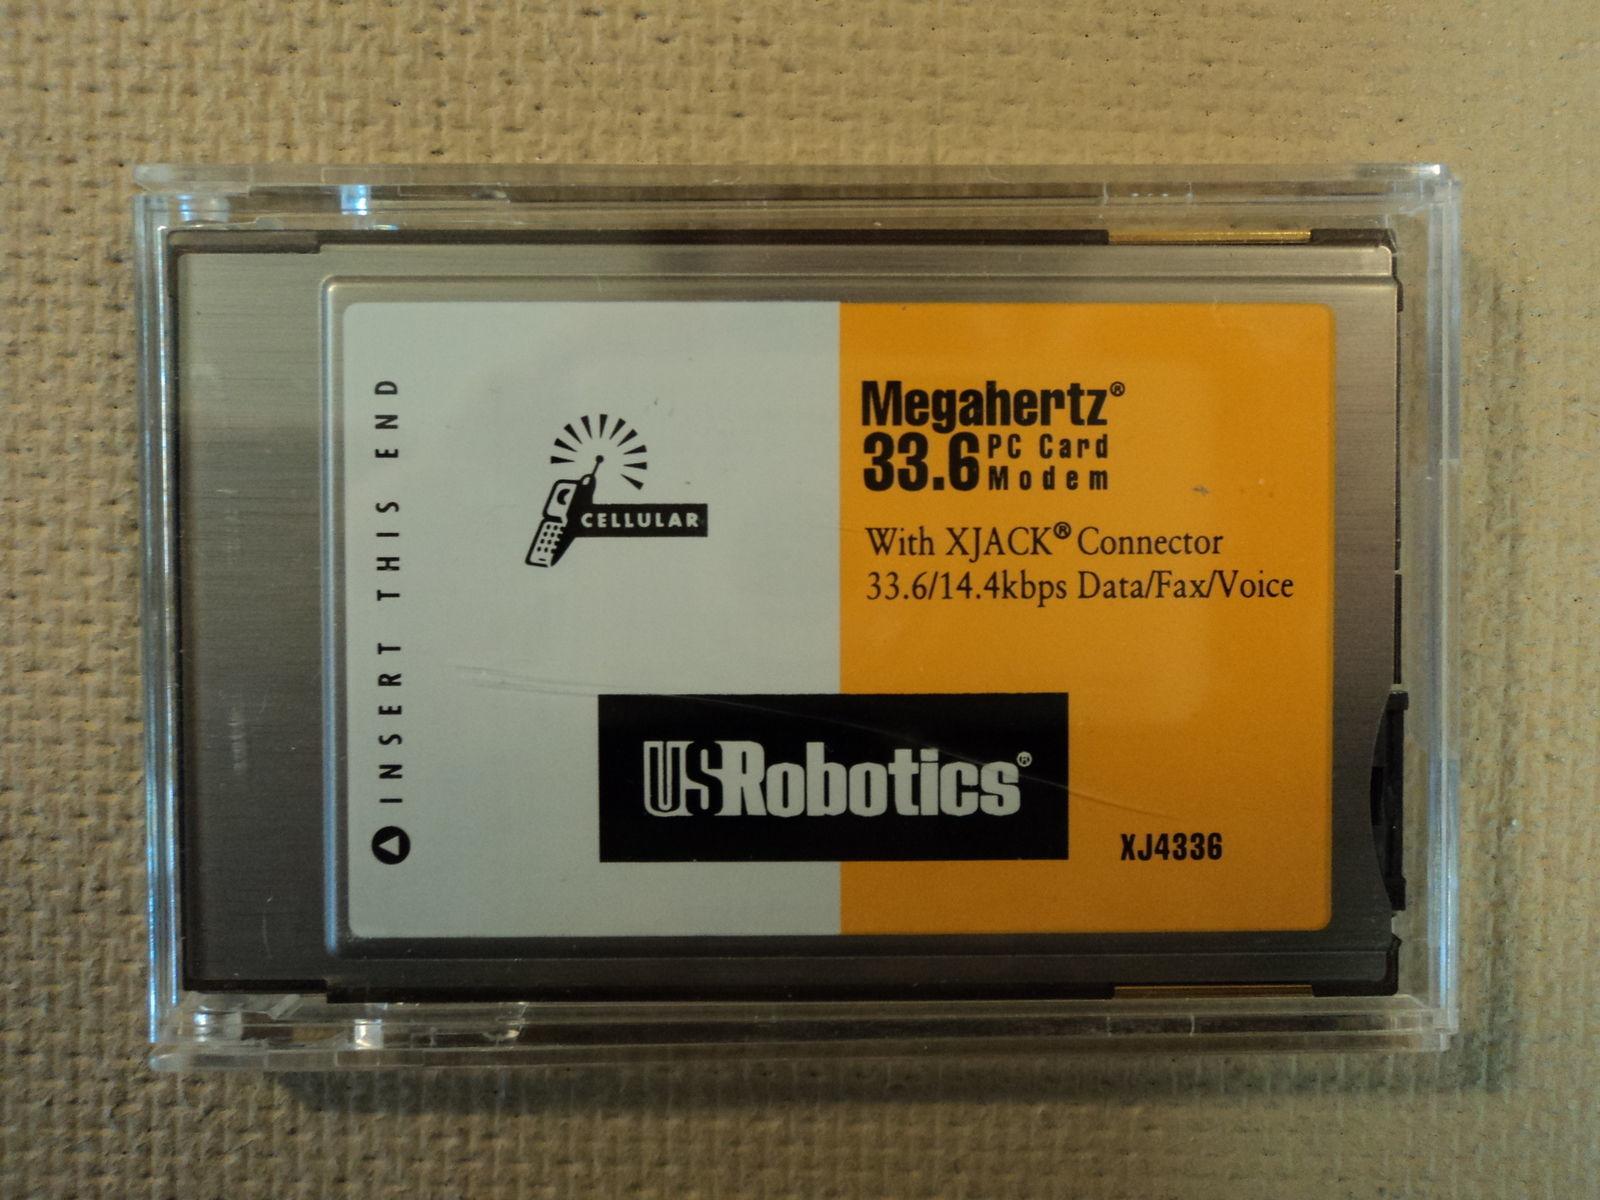 US Robotics Laptop 33.6 Megahertz PC Card Modem Caller ID Phone Answering XJ4336